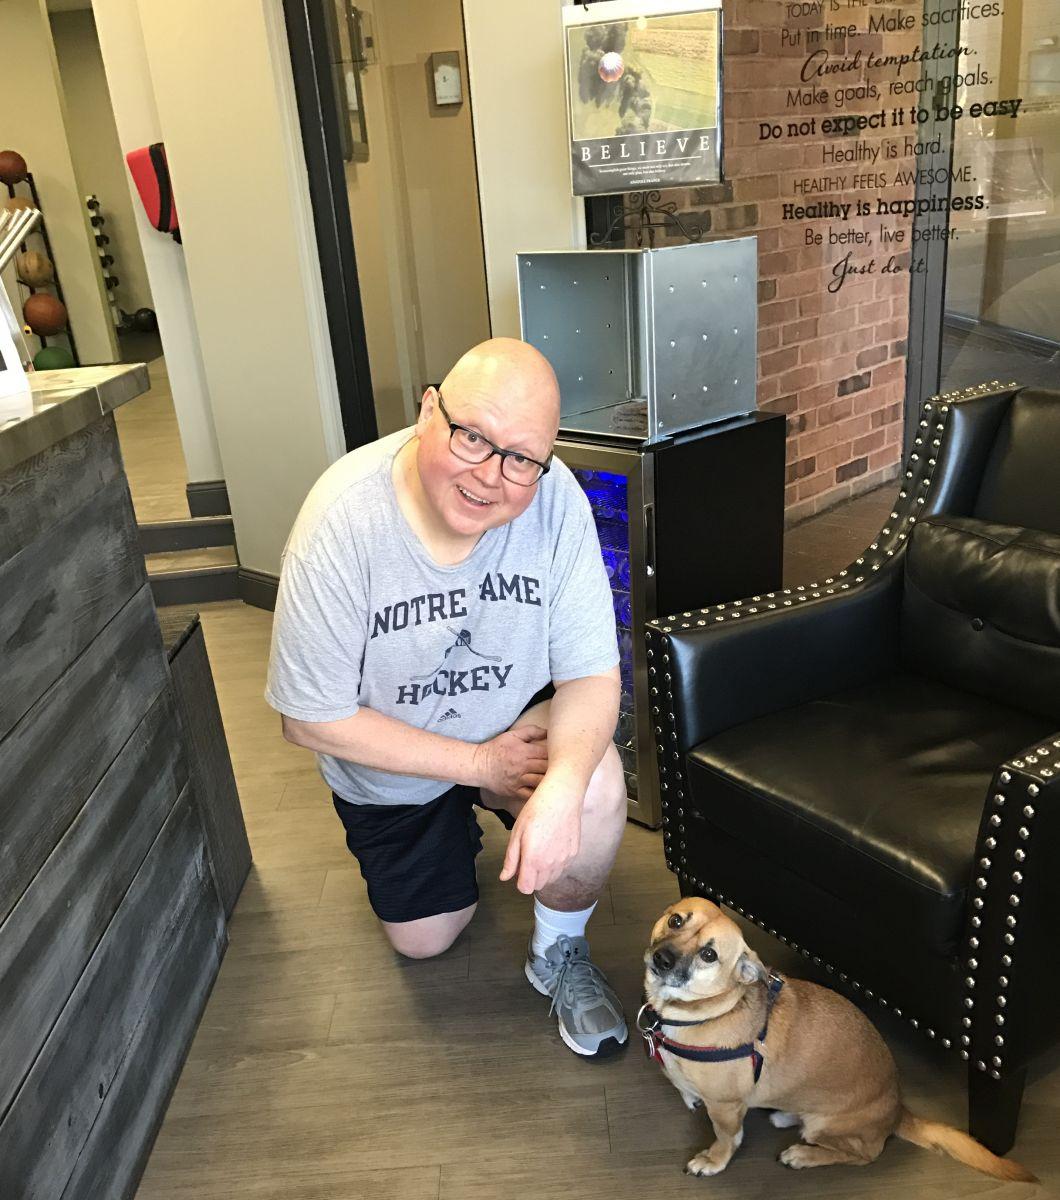 joe kneeling with dog